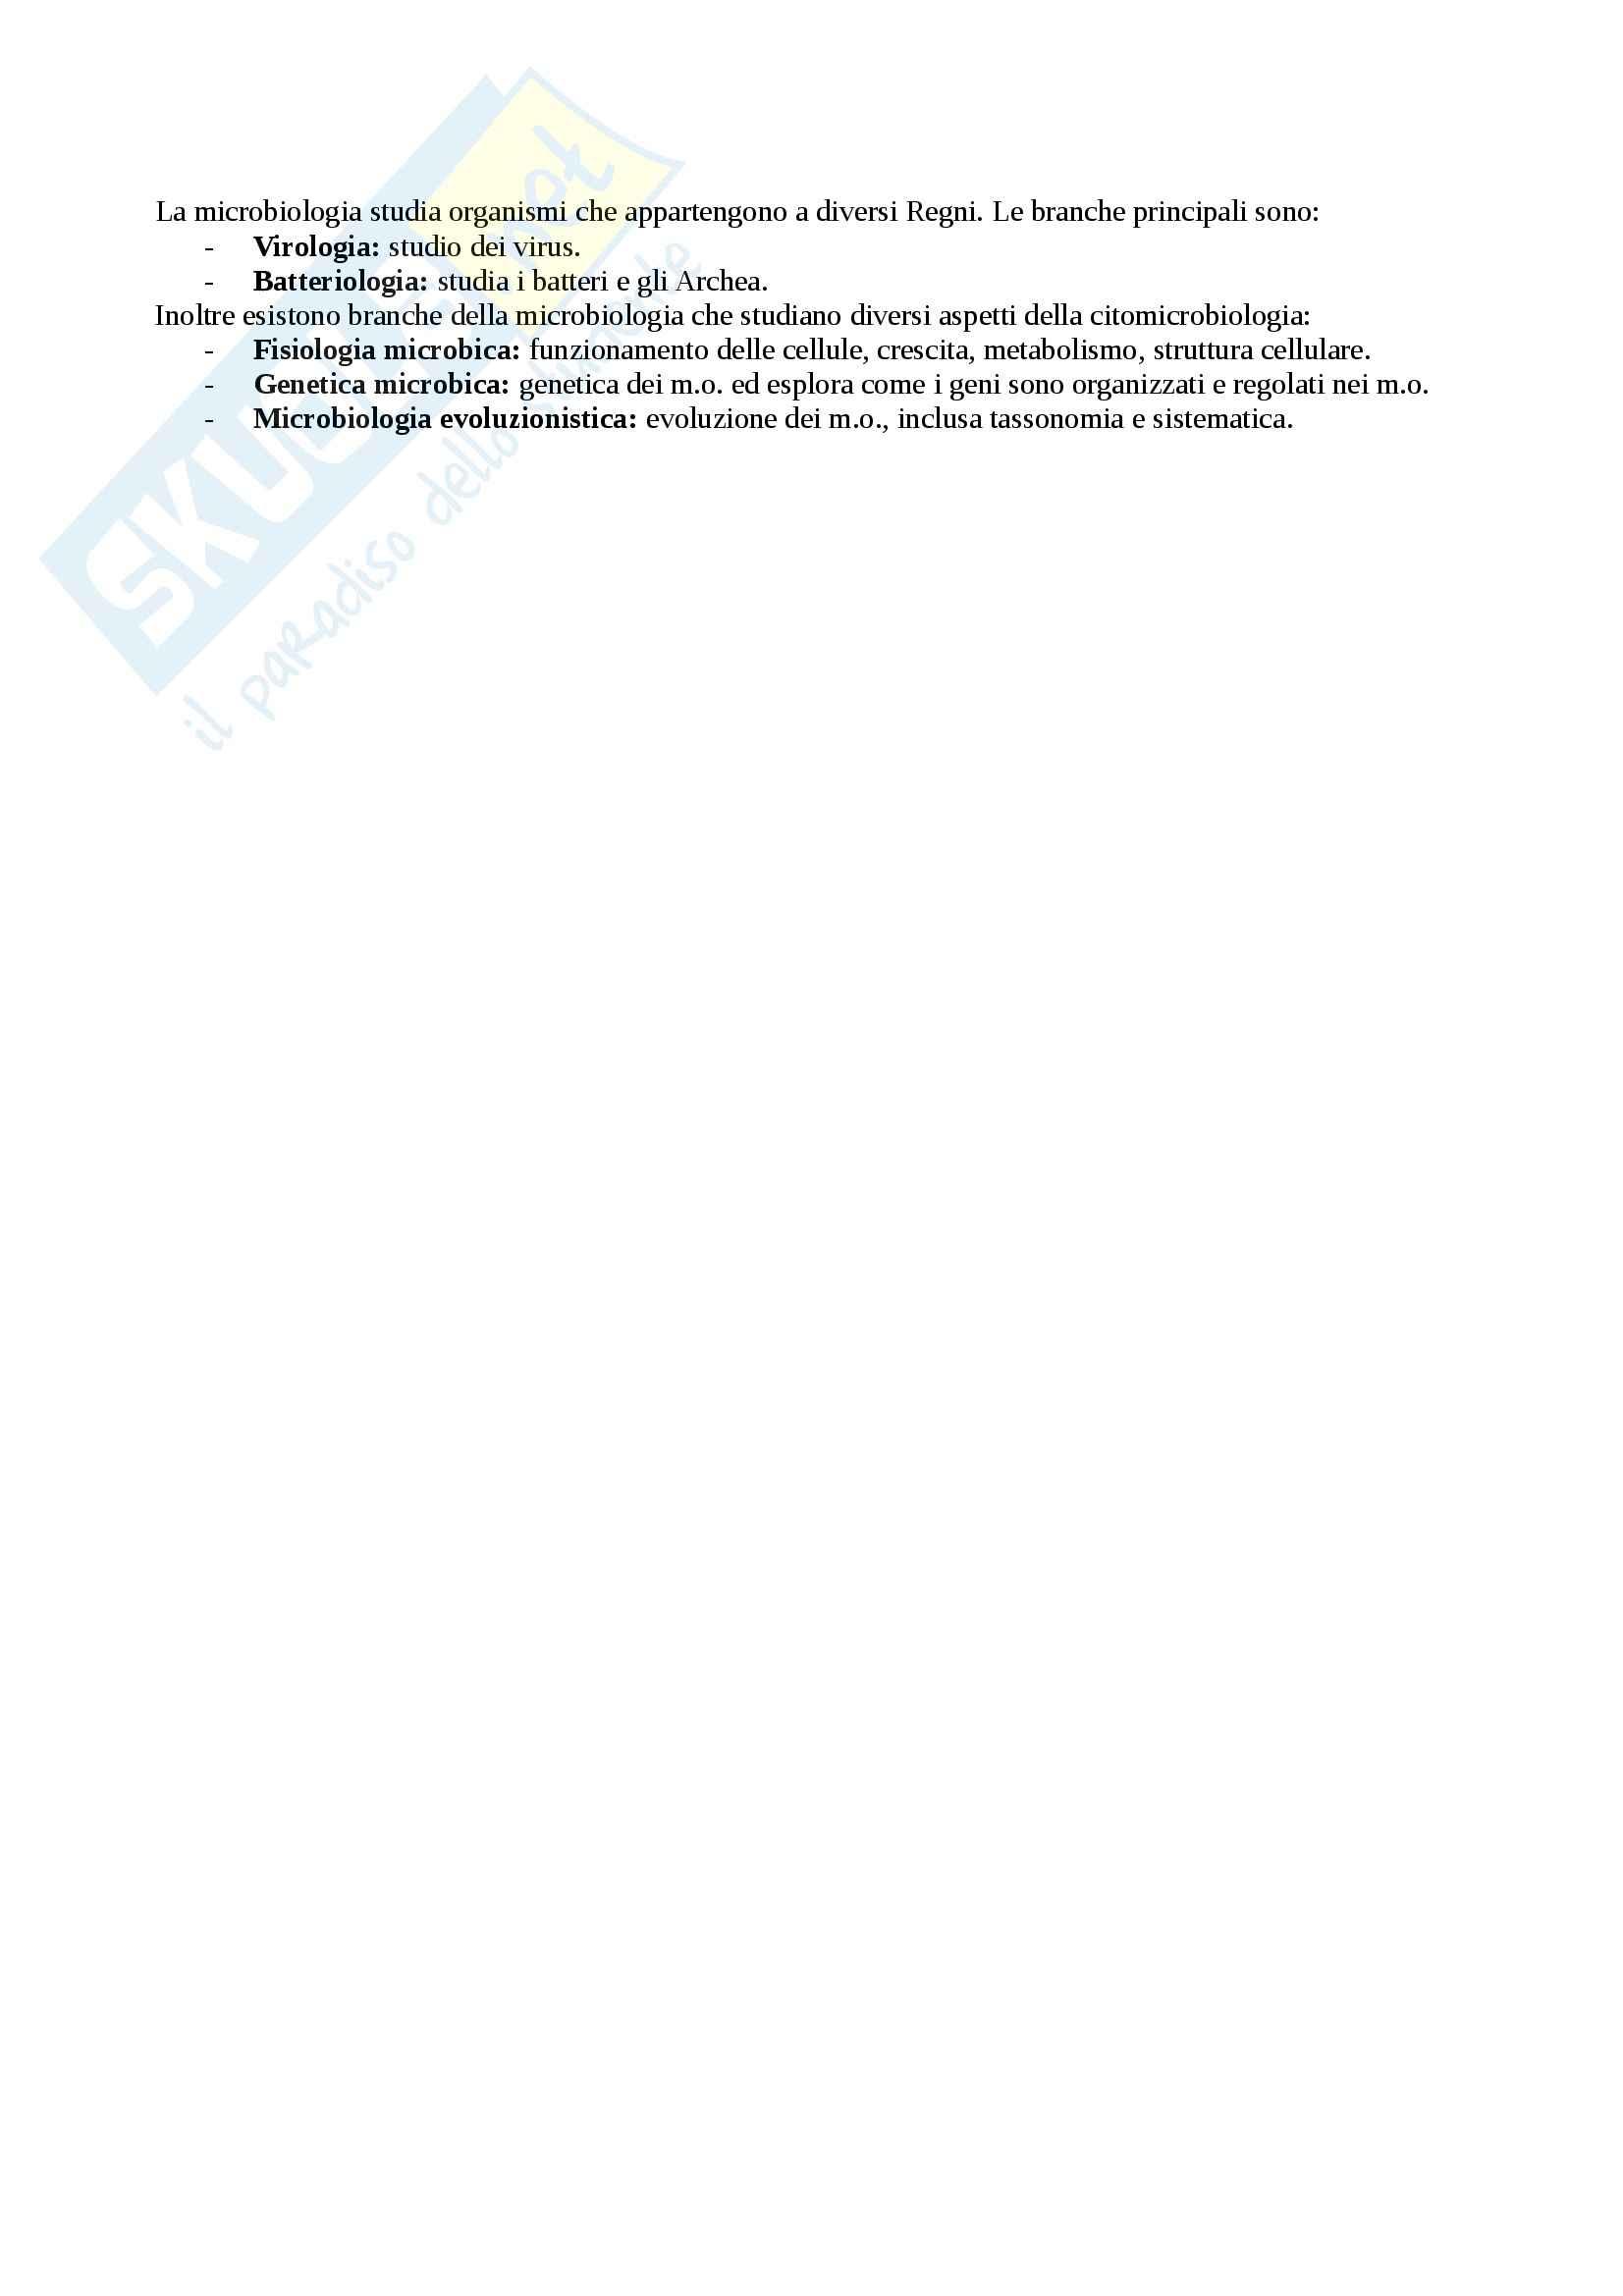 Microbiologia agraria - Appunti Pag. 6